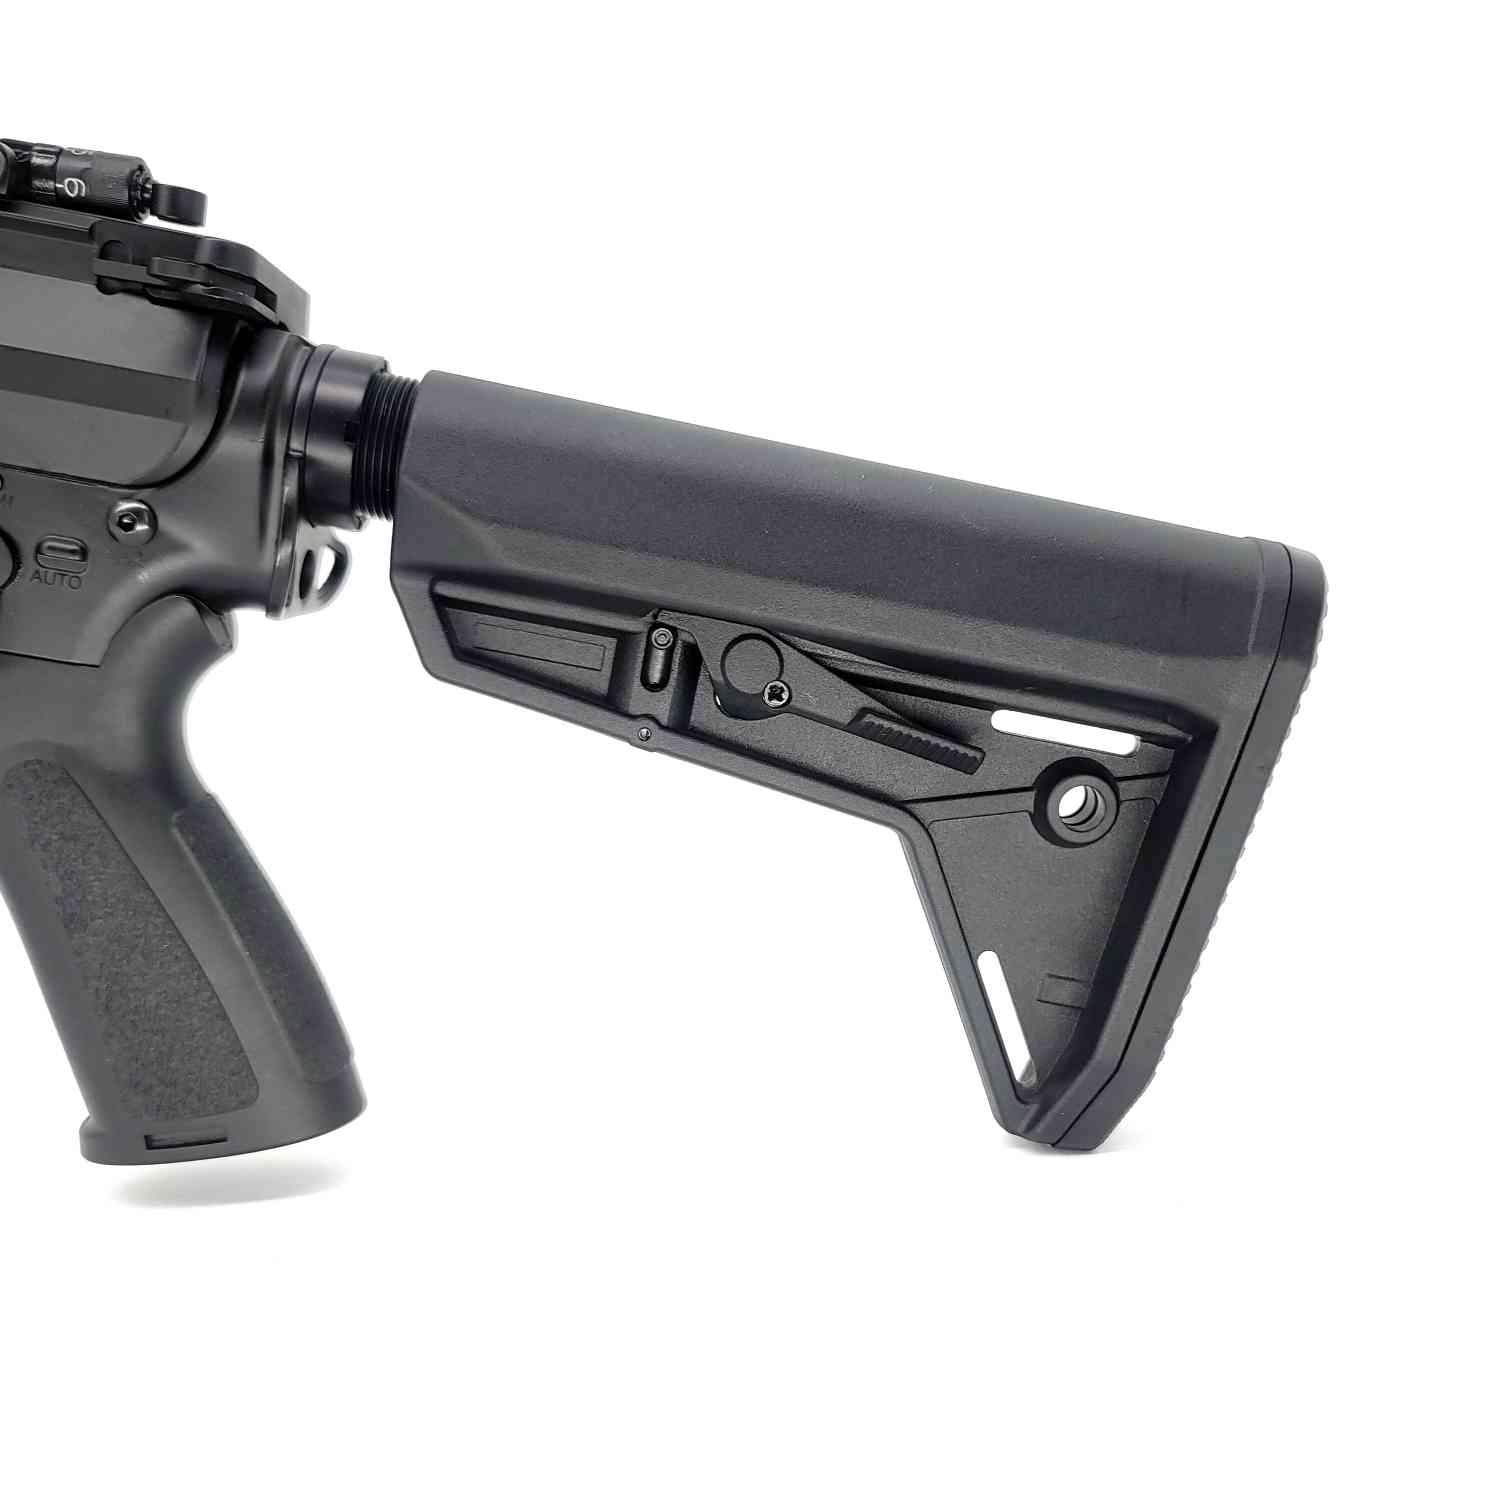 DOUBLE BELL TTI AR-15 Metal Gel Blaster with Scope (John Wick Edition) [059] Renegade Blasters